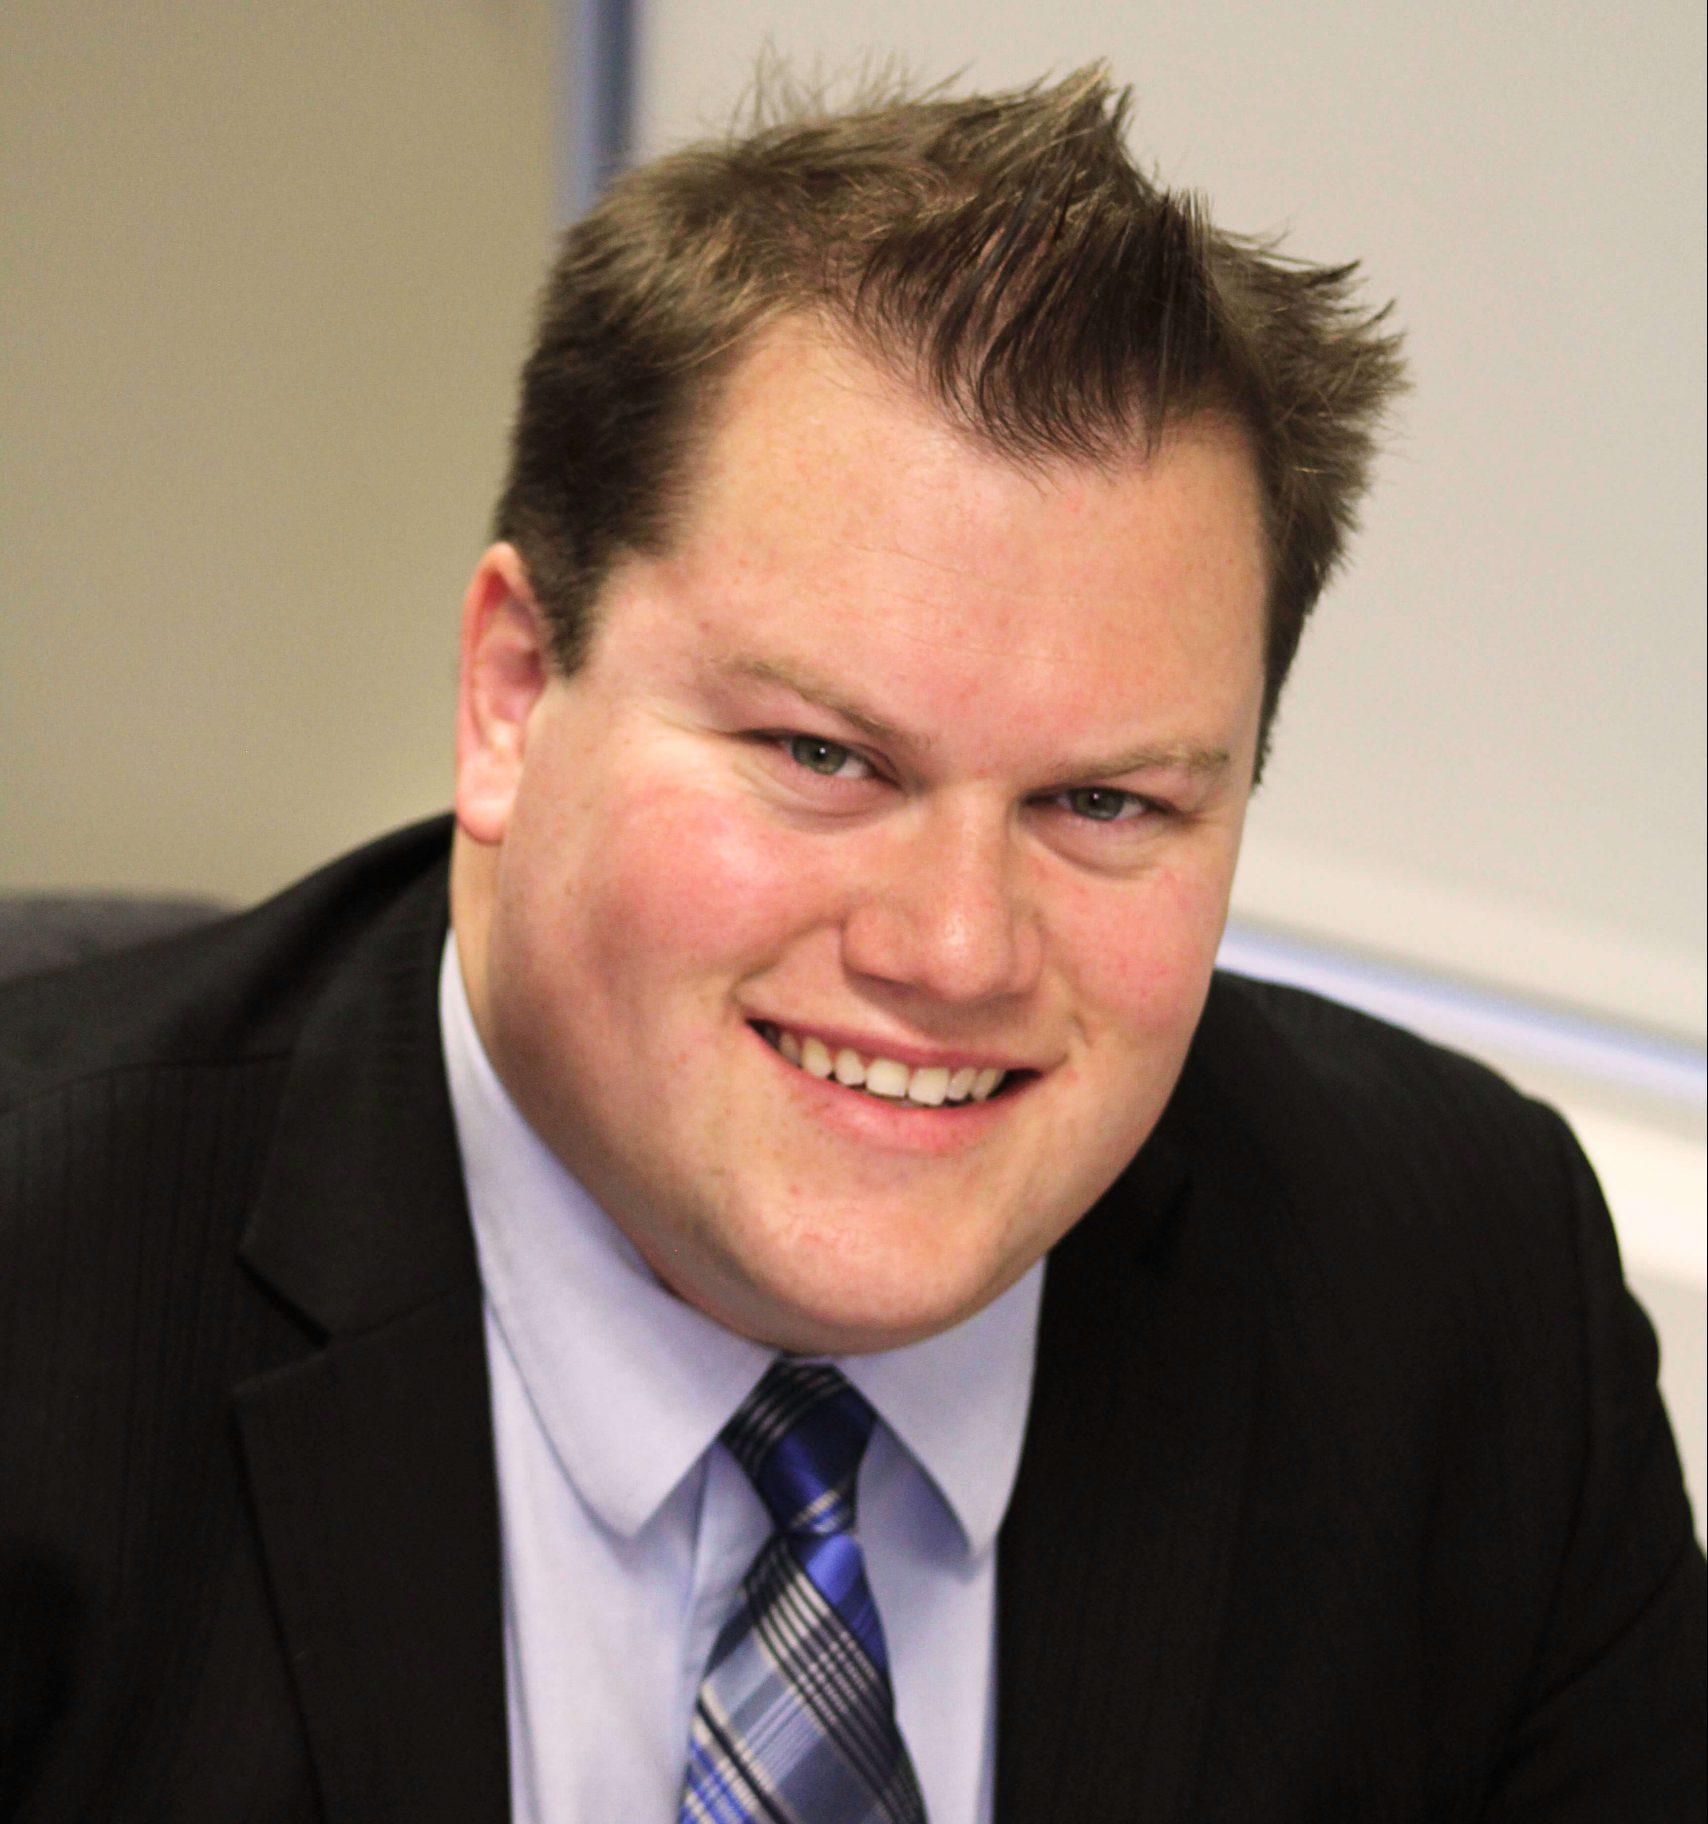 Foundation Board Member smiling